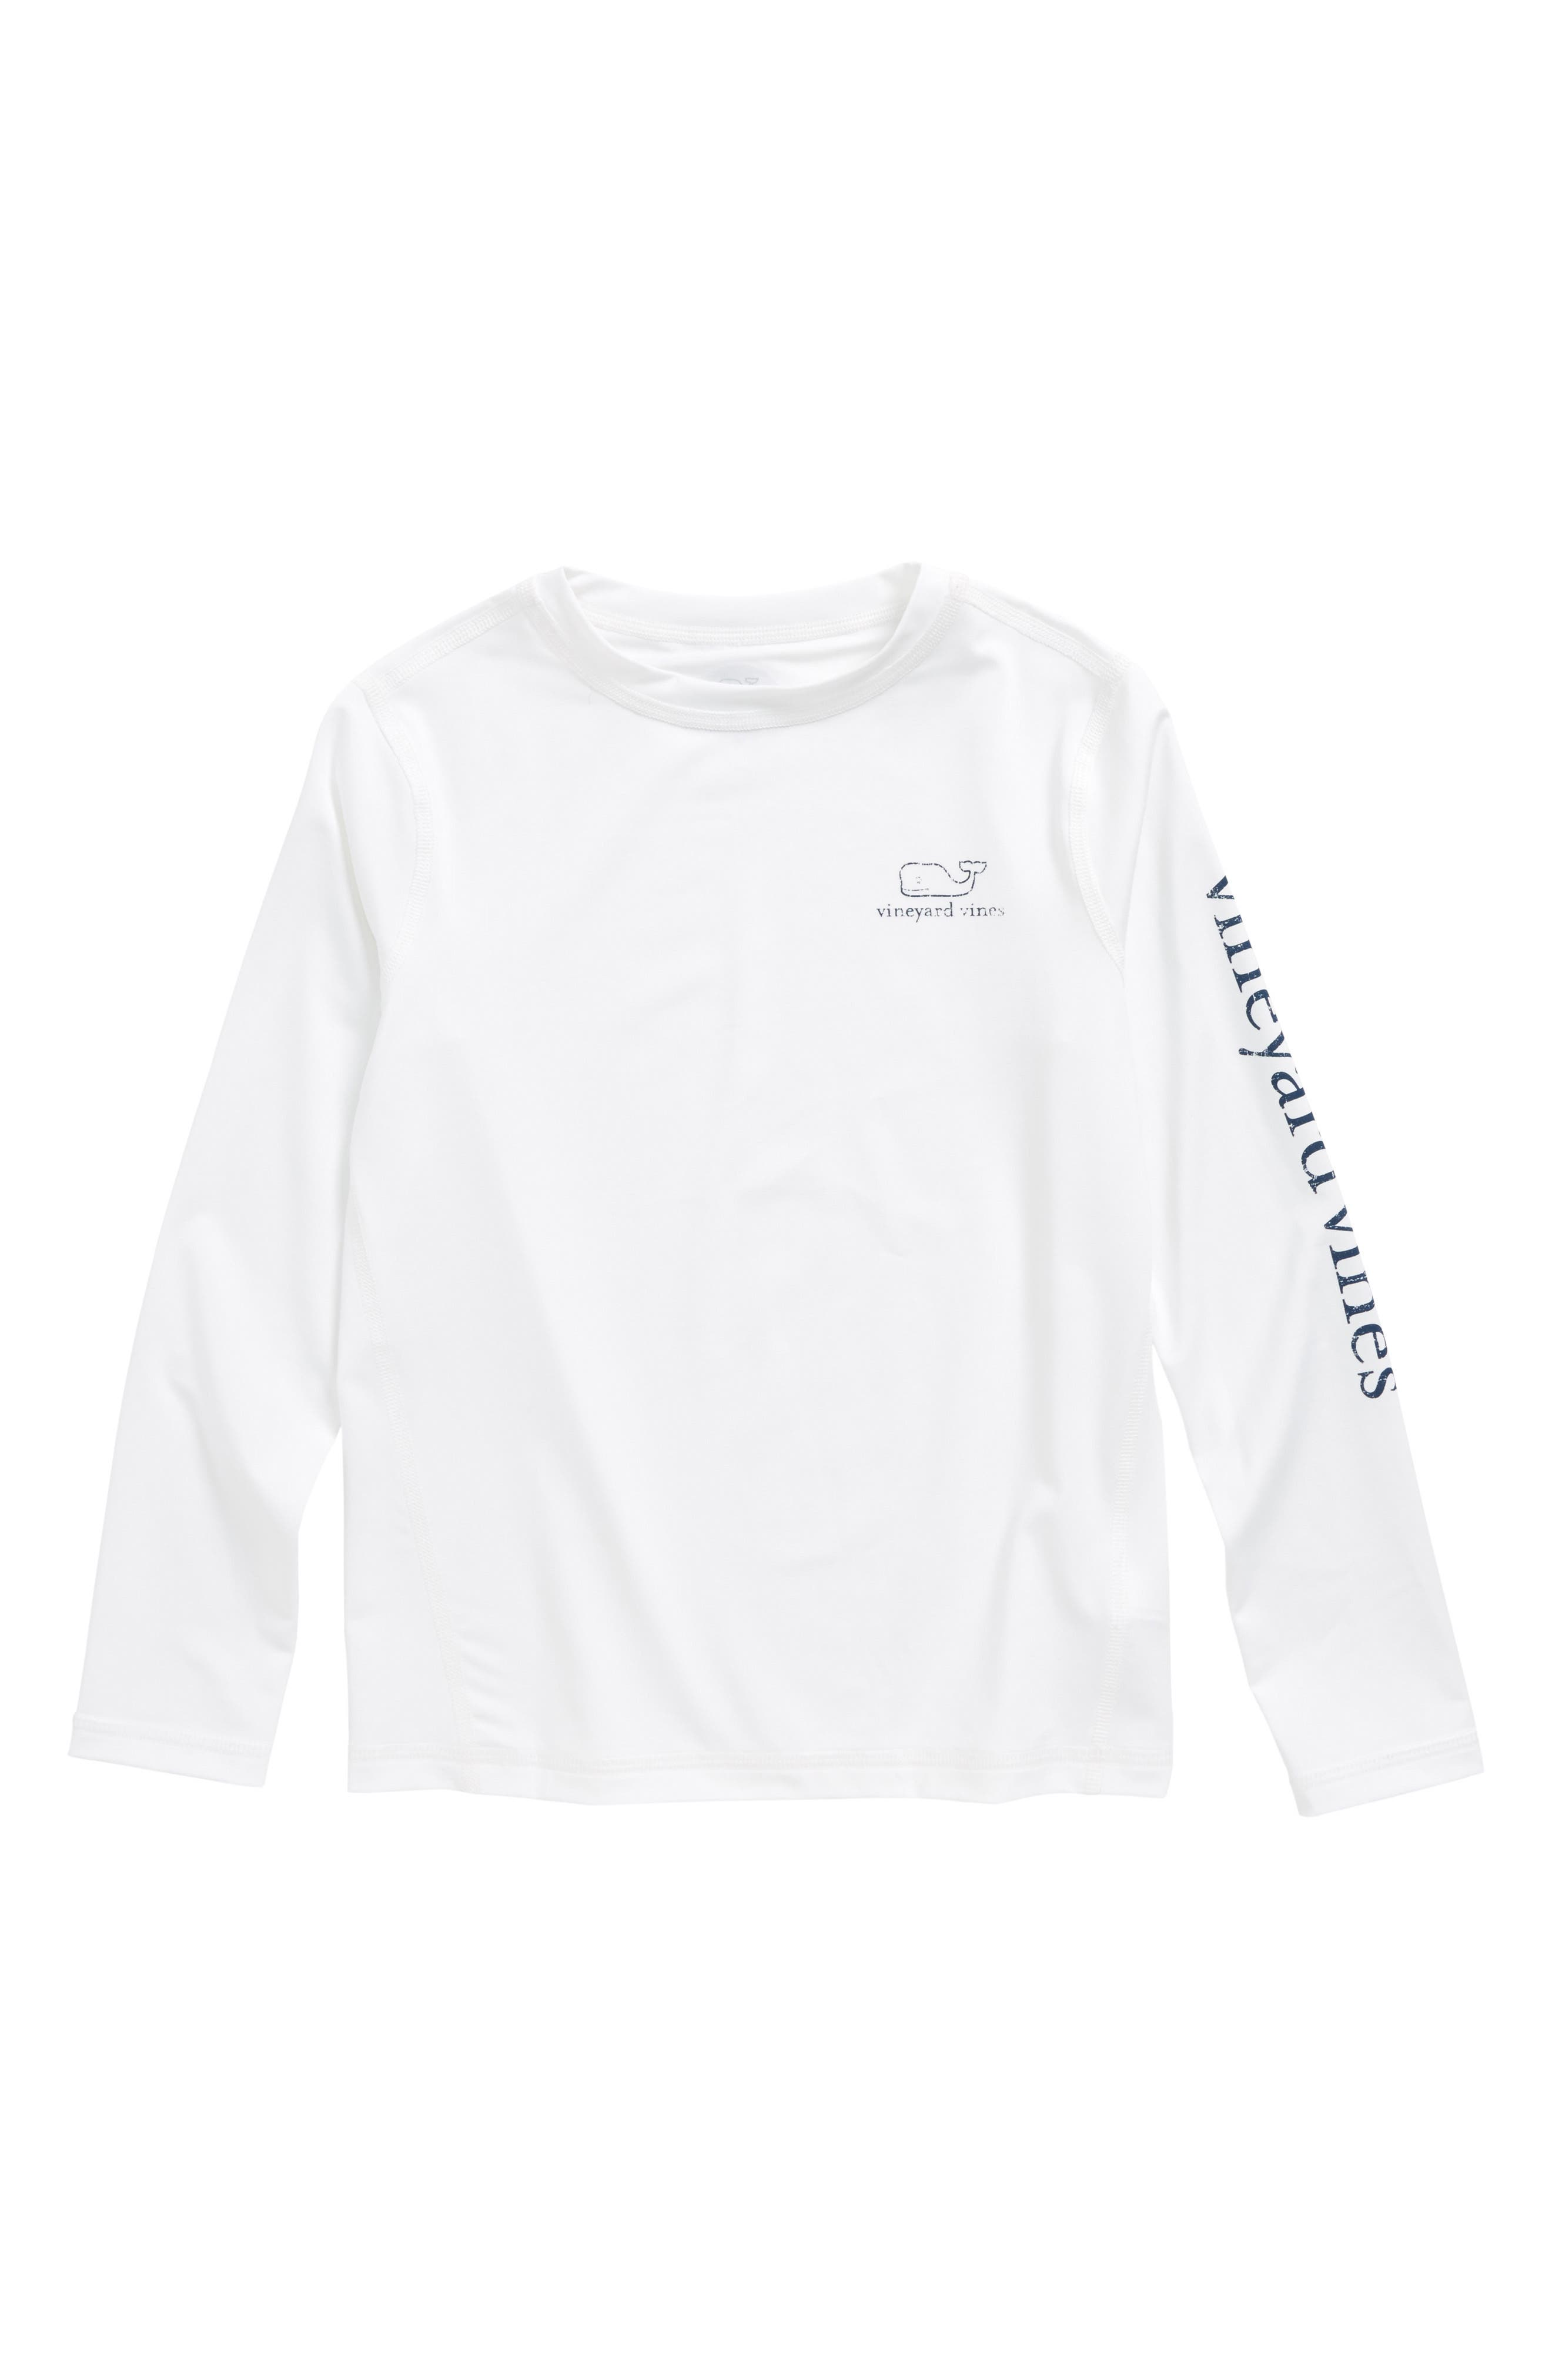 Long Sleeve Rashguard Top,                             Main thumbnail 1, color,                             WHITE CAP